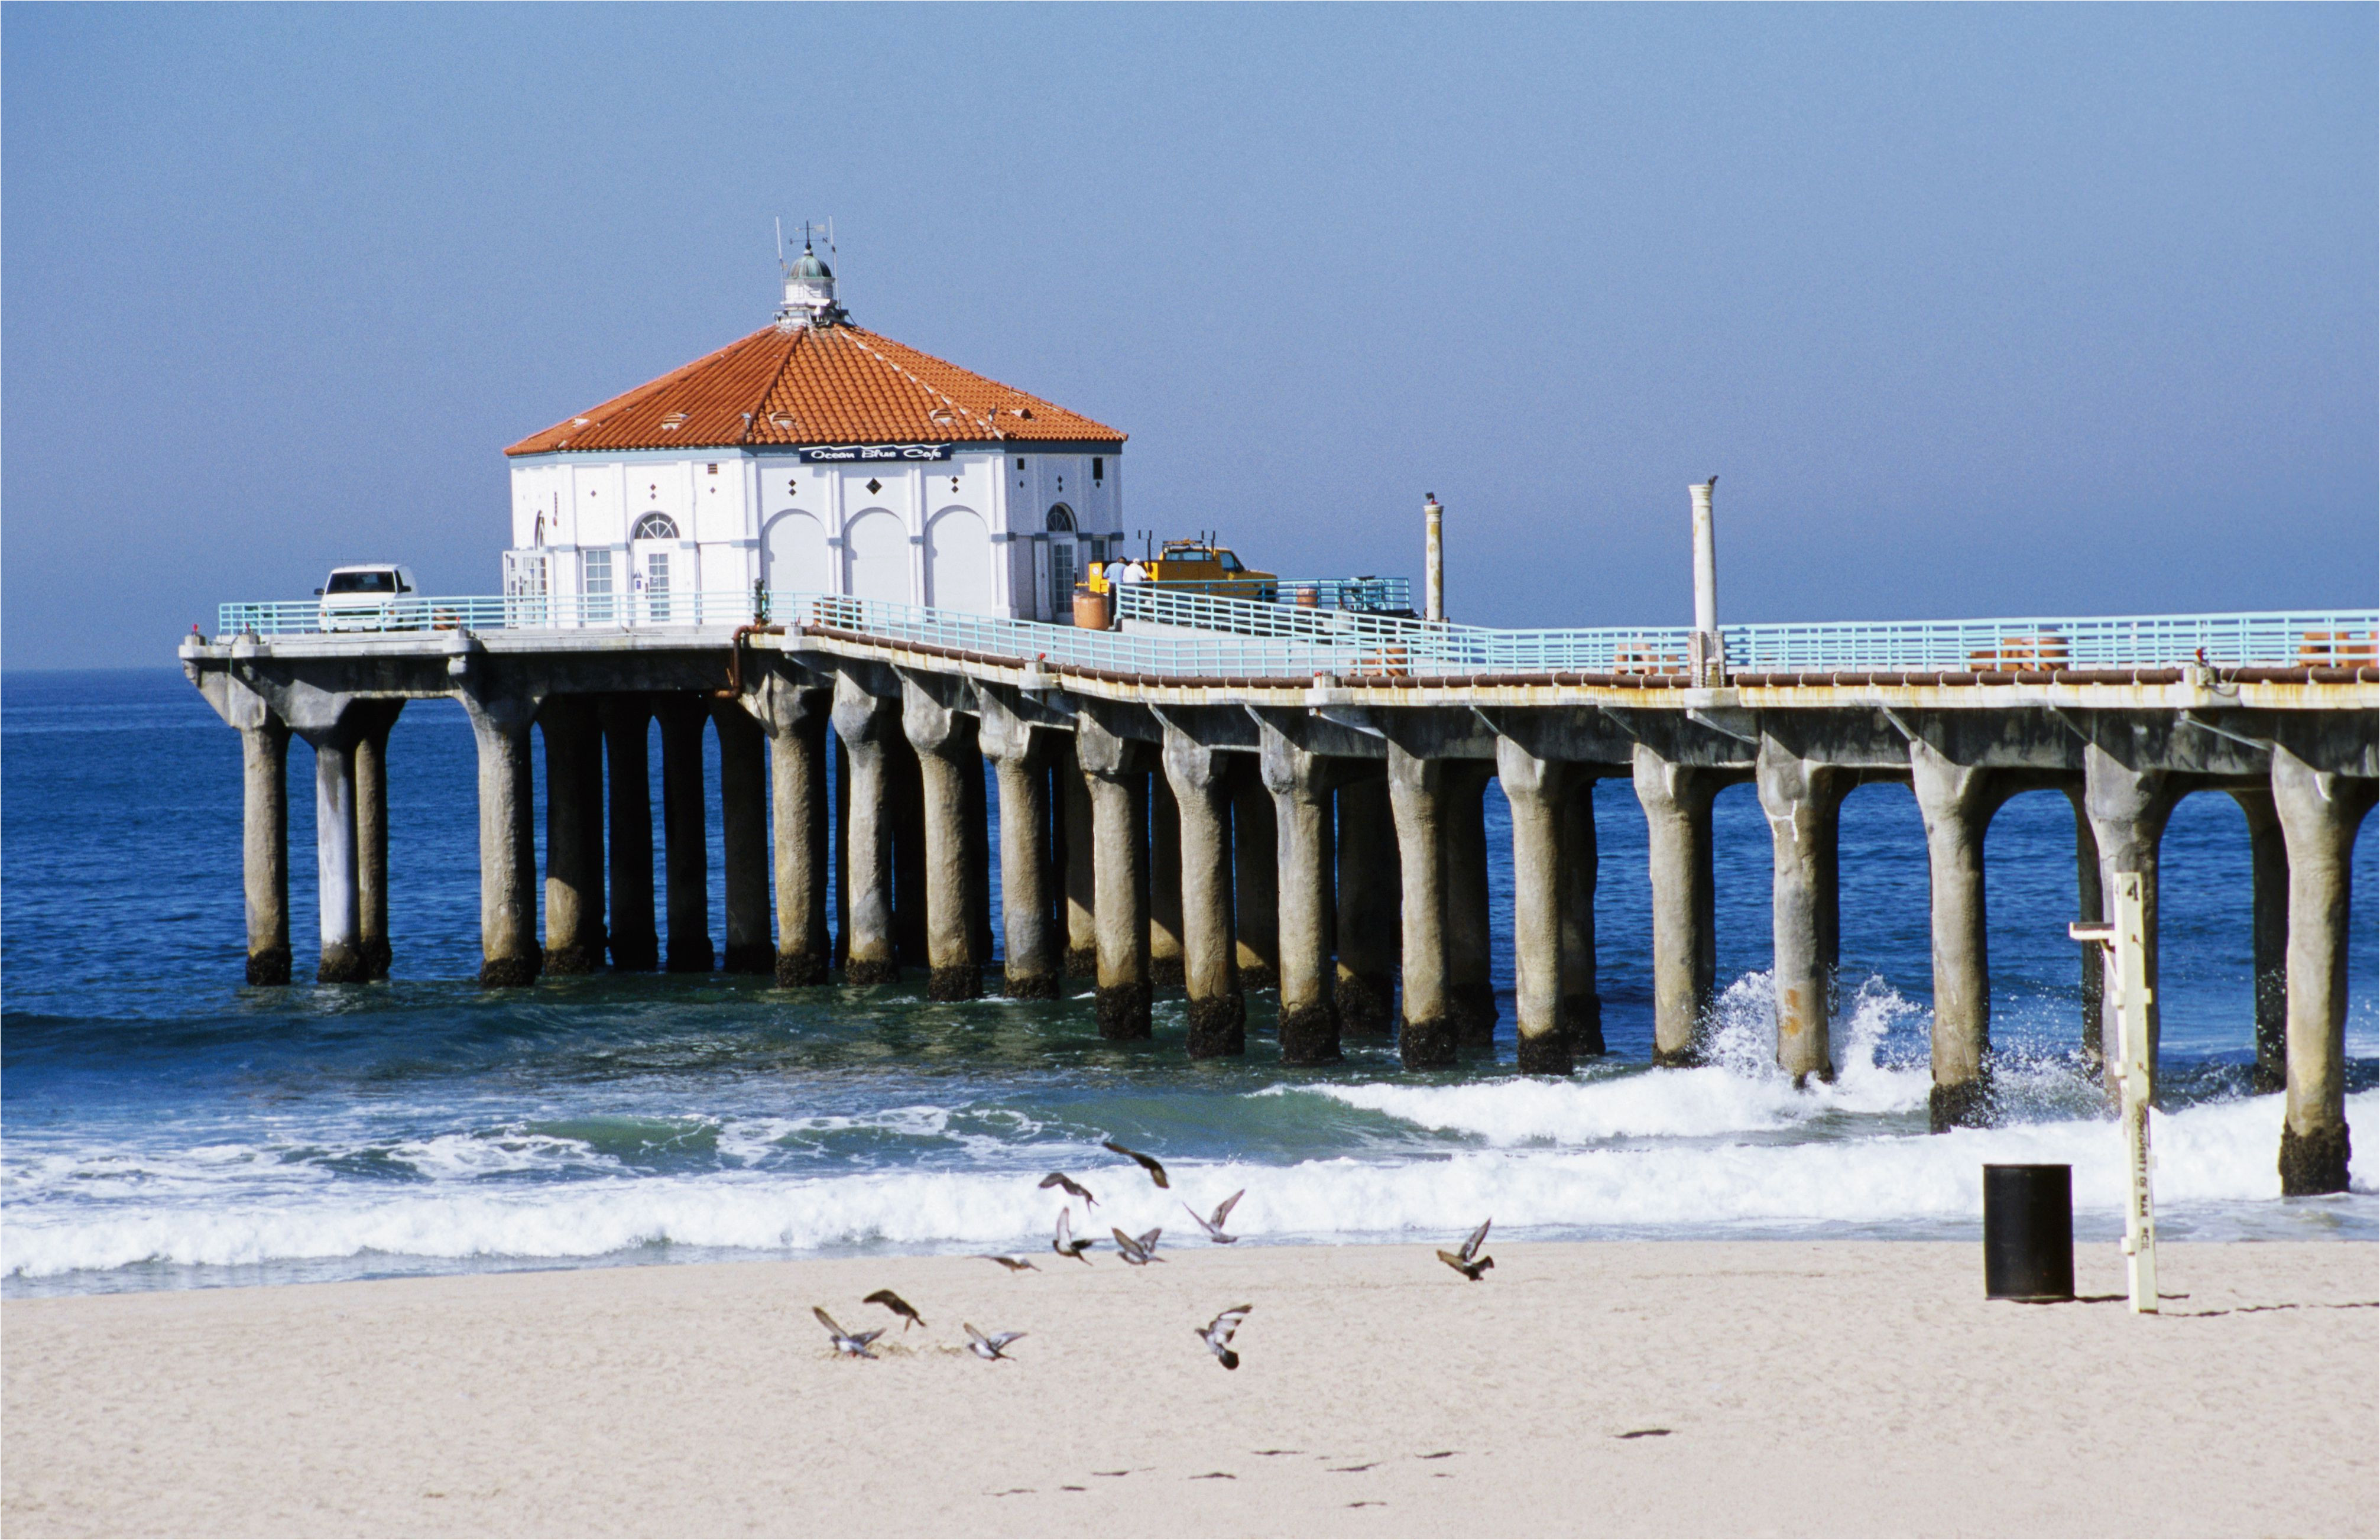 where to stay in manhattan beach hermosa beach or redondo beach